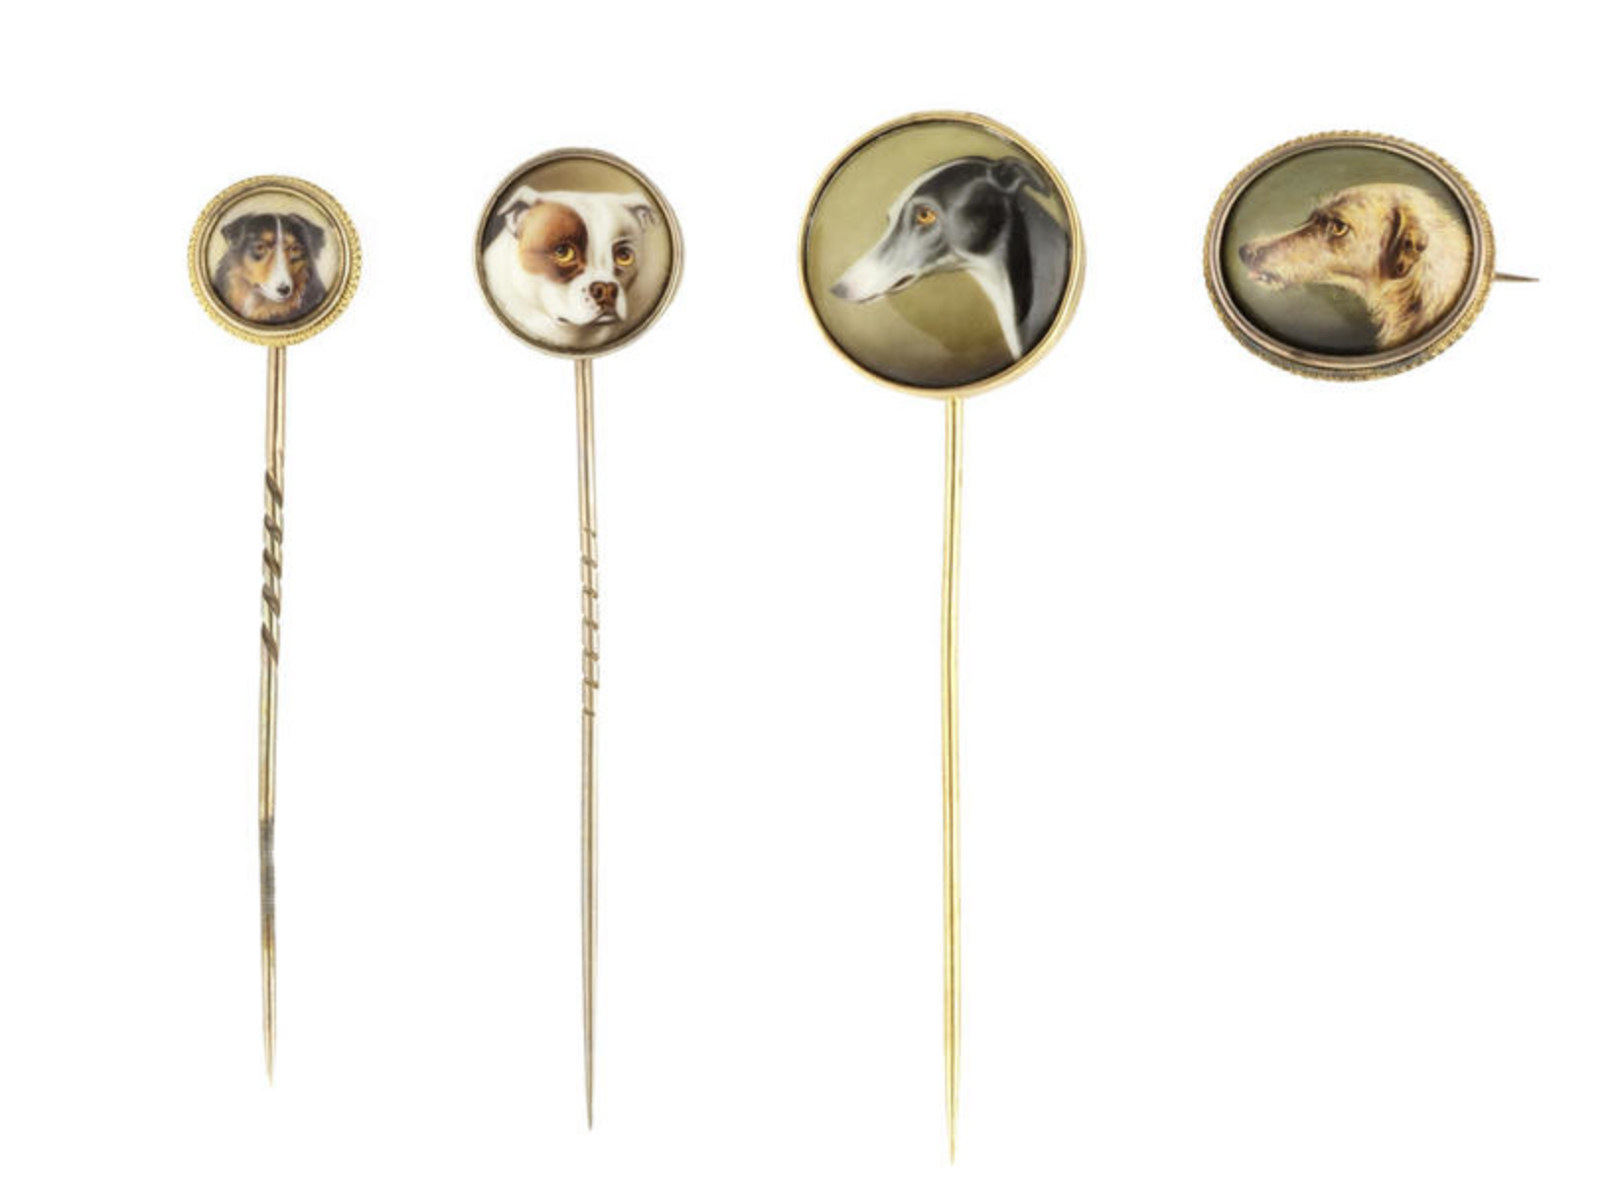 Miniature Enamels at Maison Dog